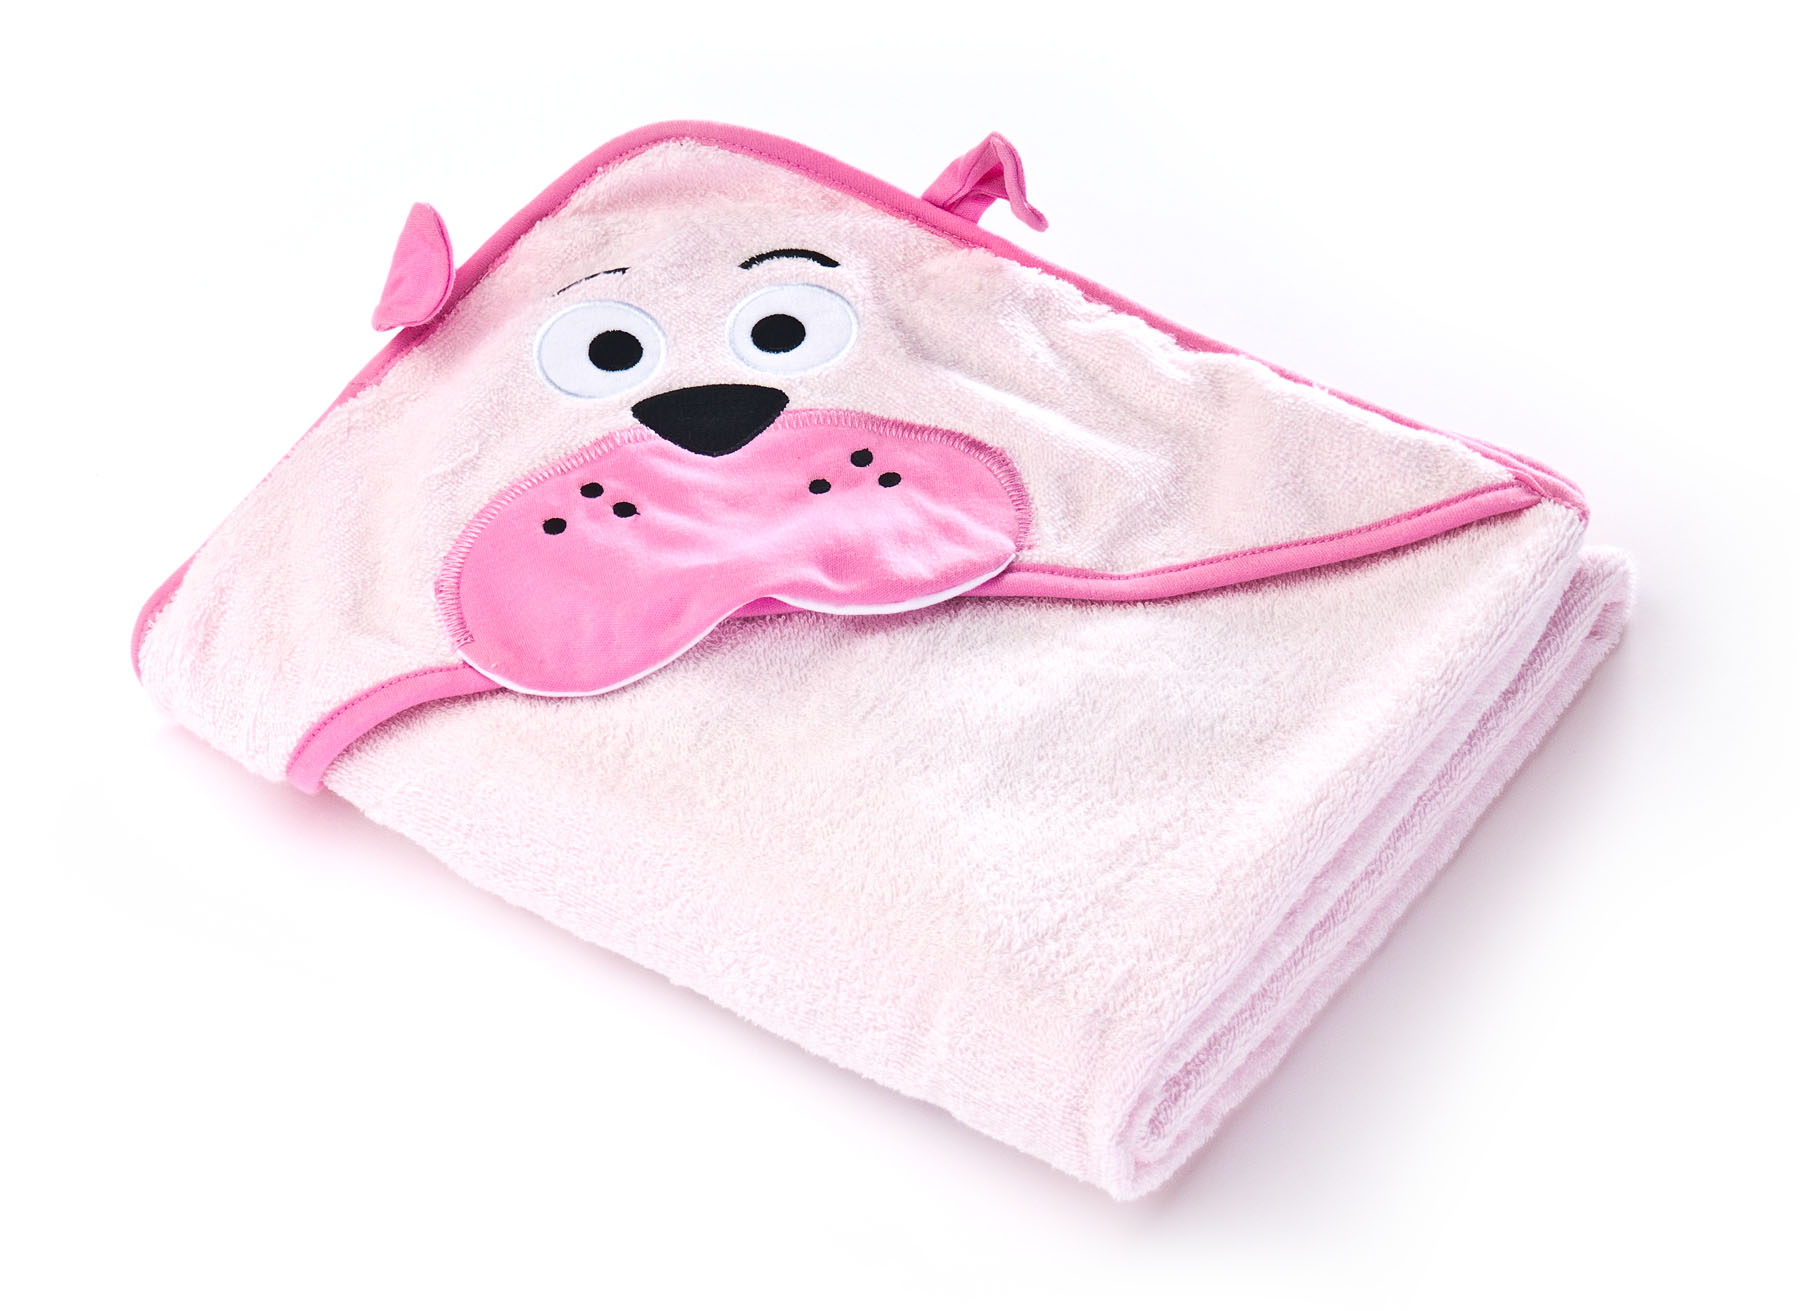 Water Friends soft bath towel – pink teddy bear